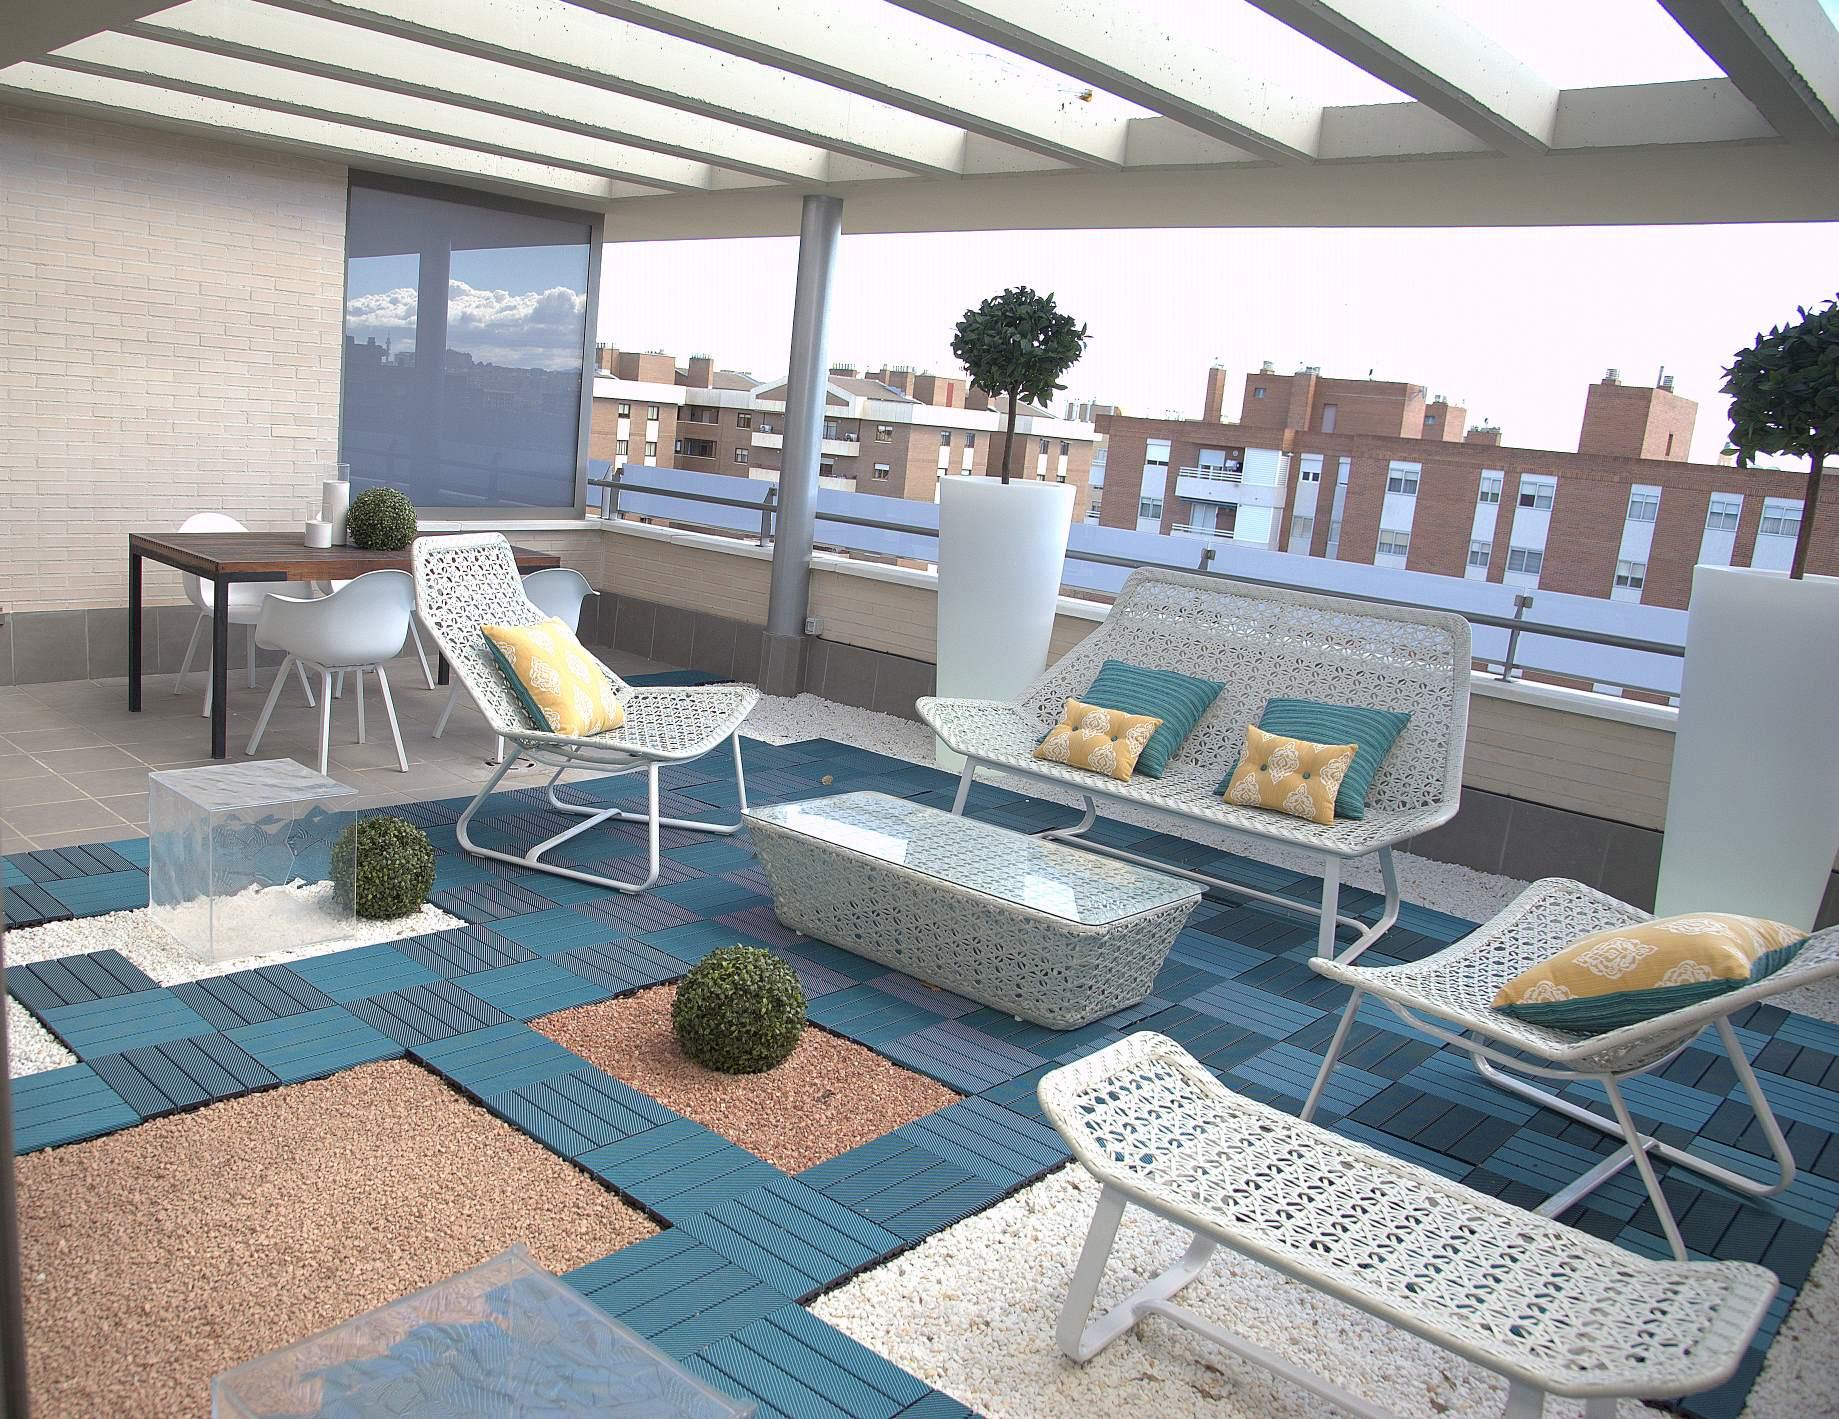 Maceteros iluminados un juego de luces en la terraza for Decoracion terrazas aticos